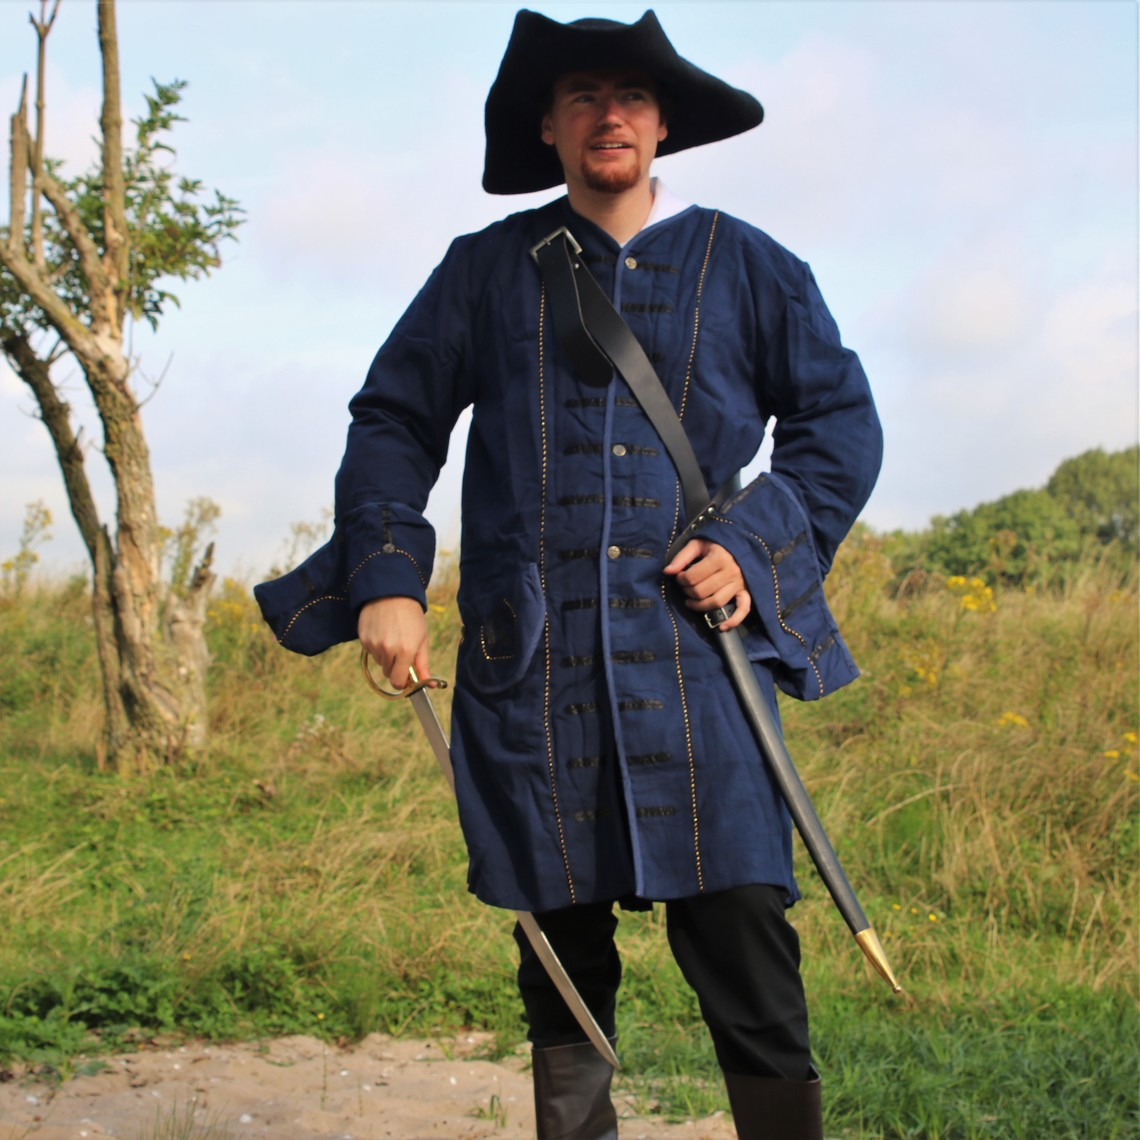 Leonardo Carbone 17. århundrede Pirate pels, blå